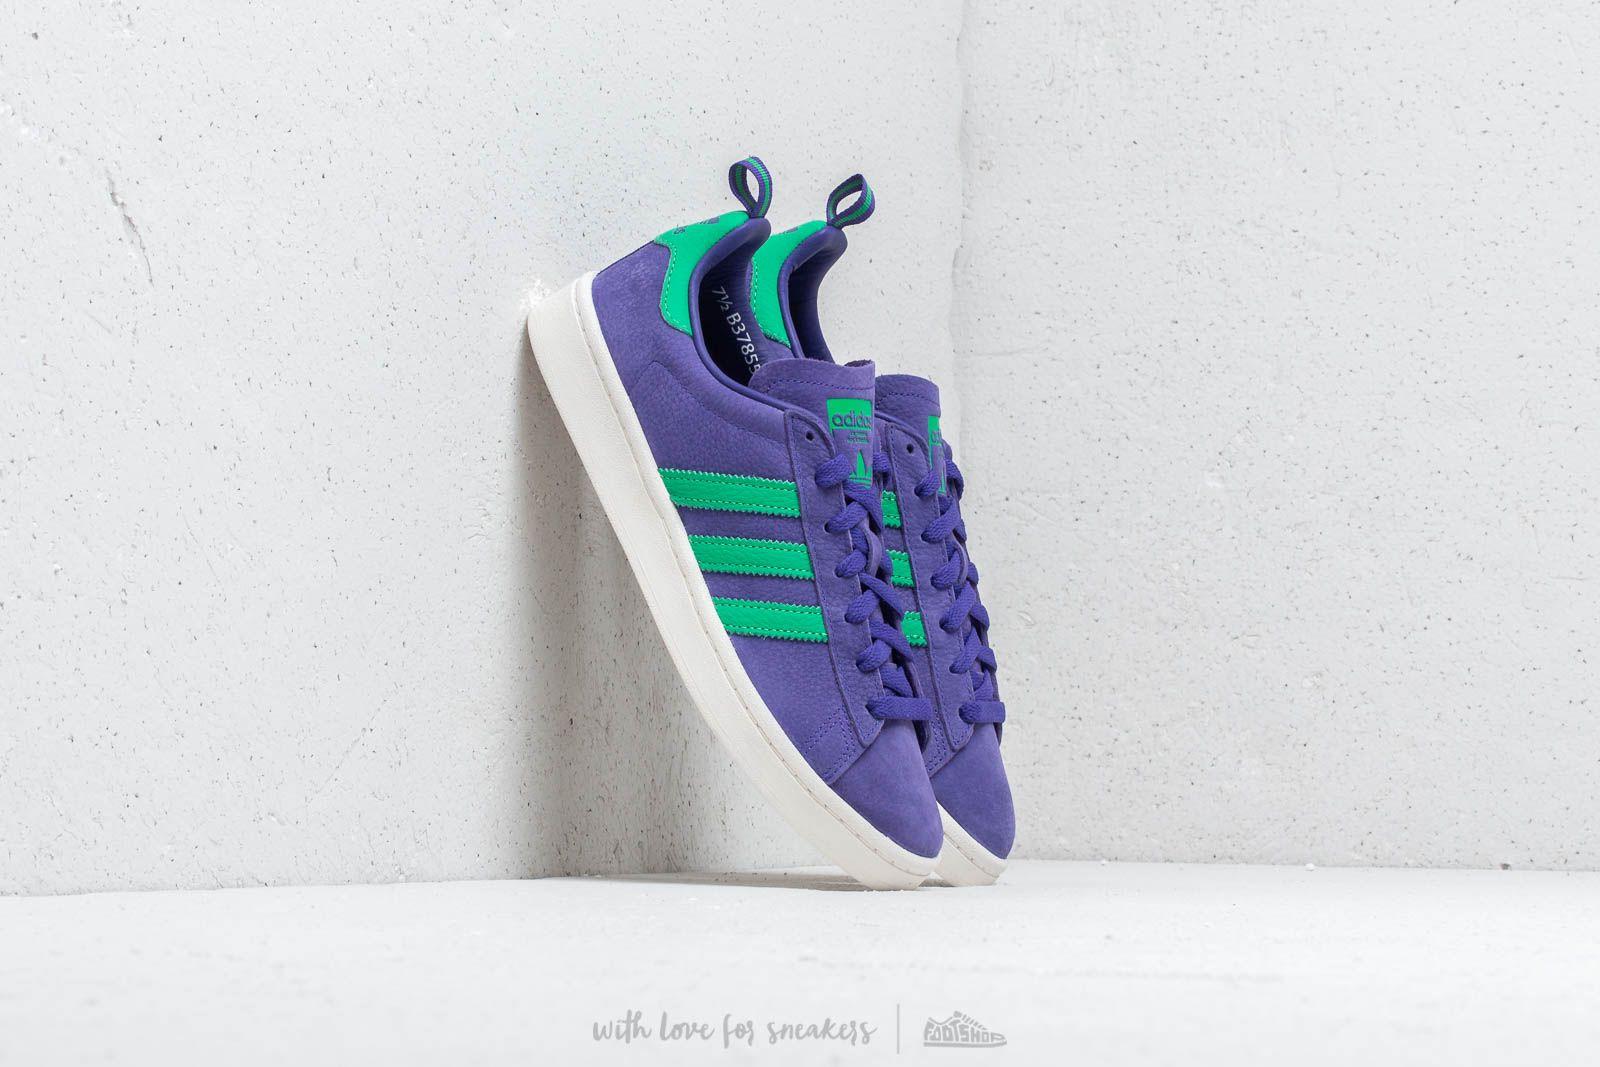 Pánské tenisky a boty adidas Campus Energy Ink/ Signal Green/ Chalk White